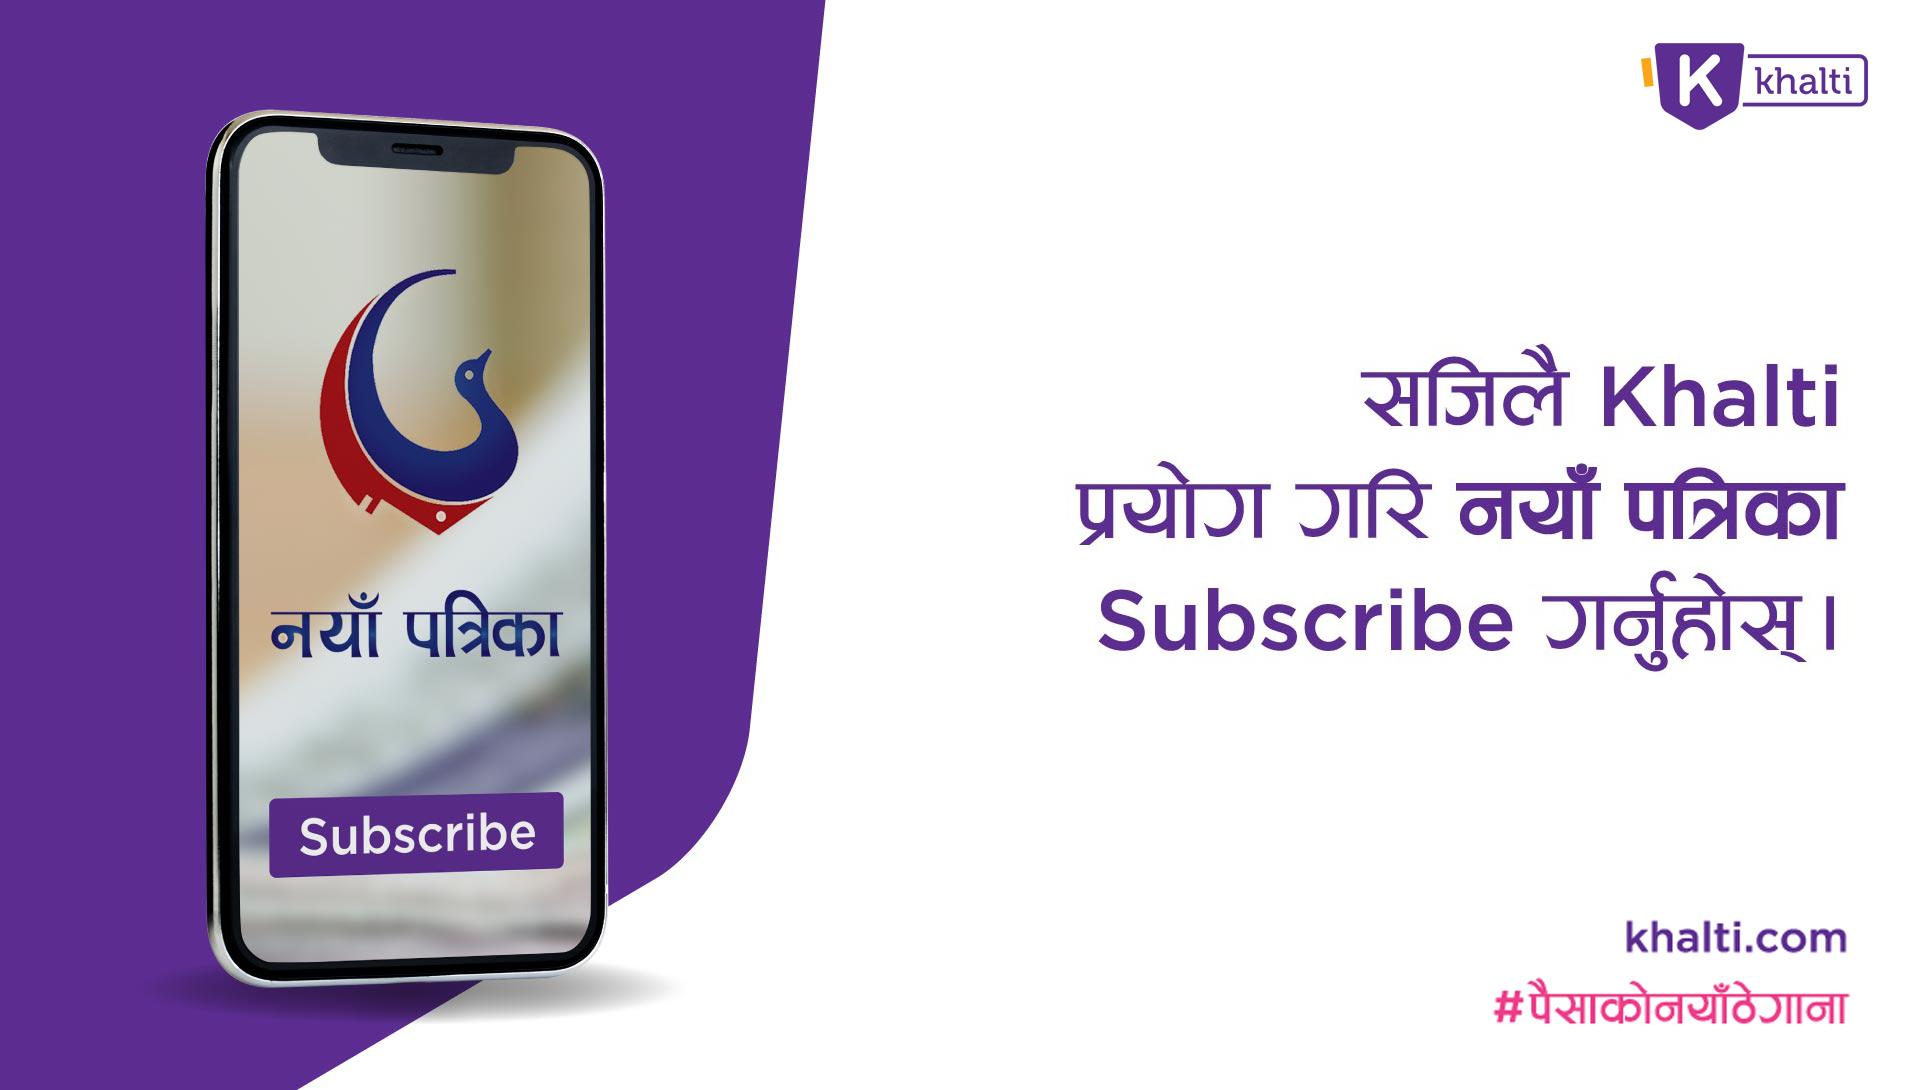 How to subscribe Naya Patrika Daily Newspaper and Pay Digitally via Khalti?